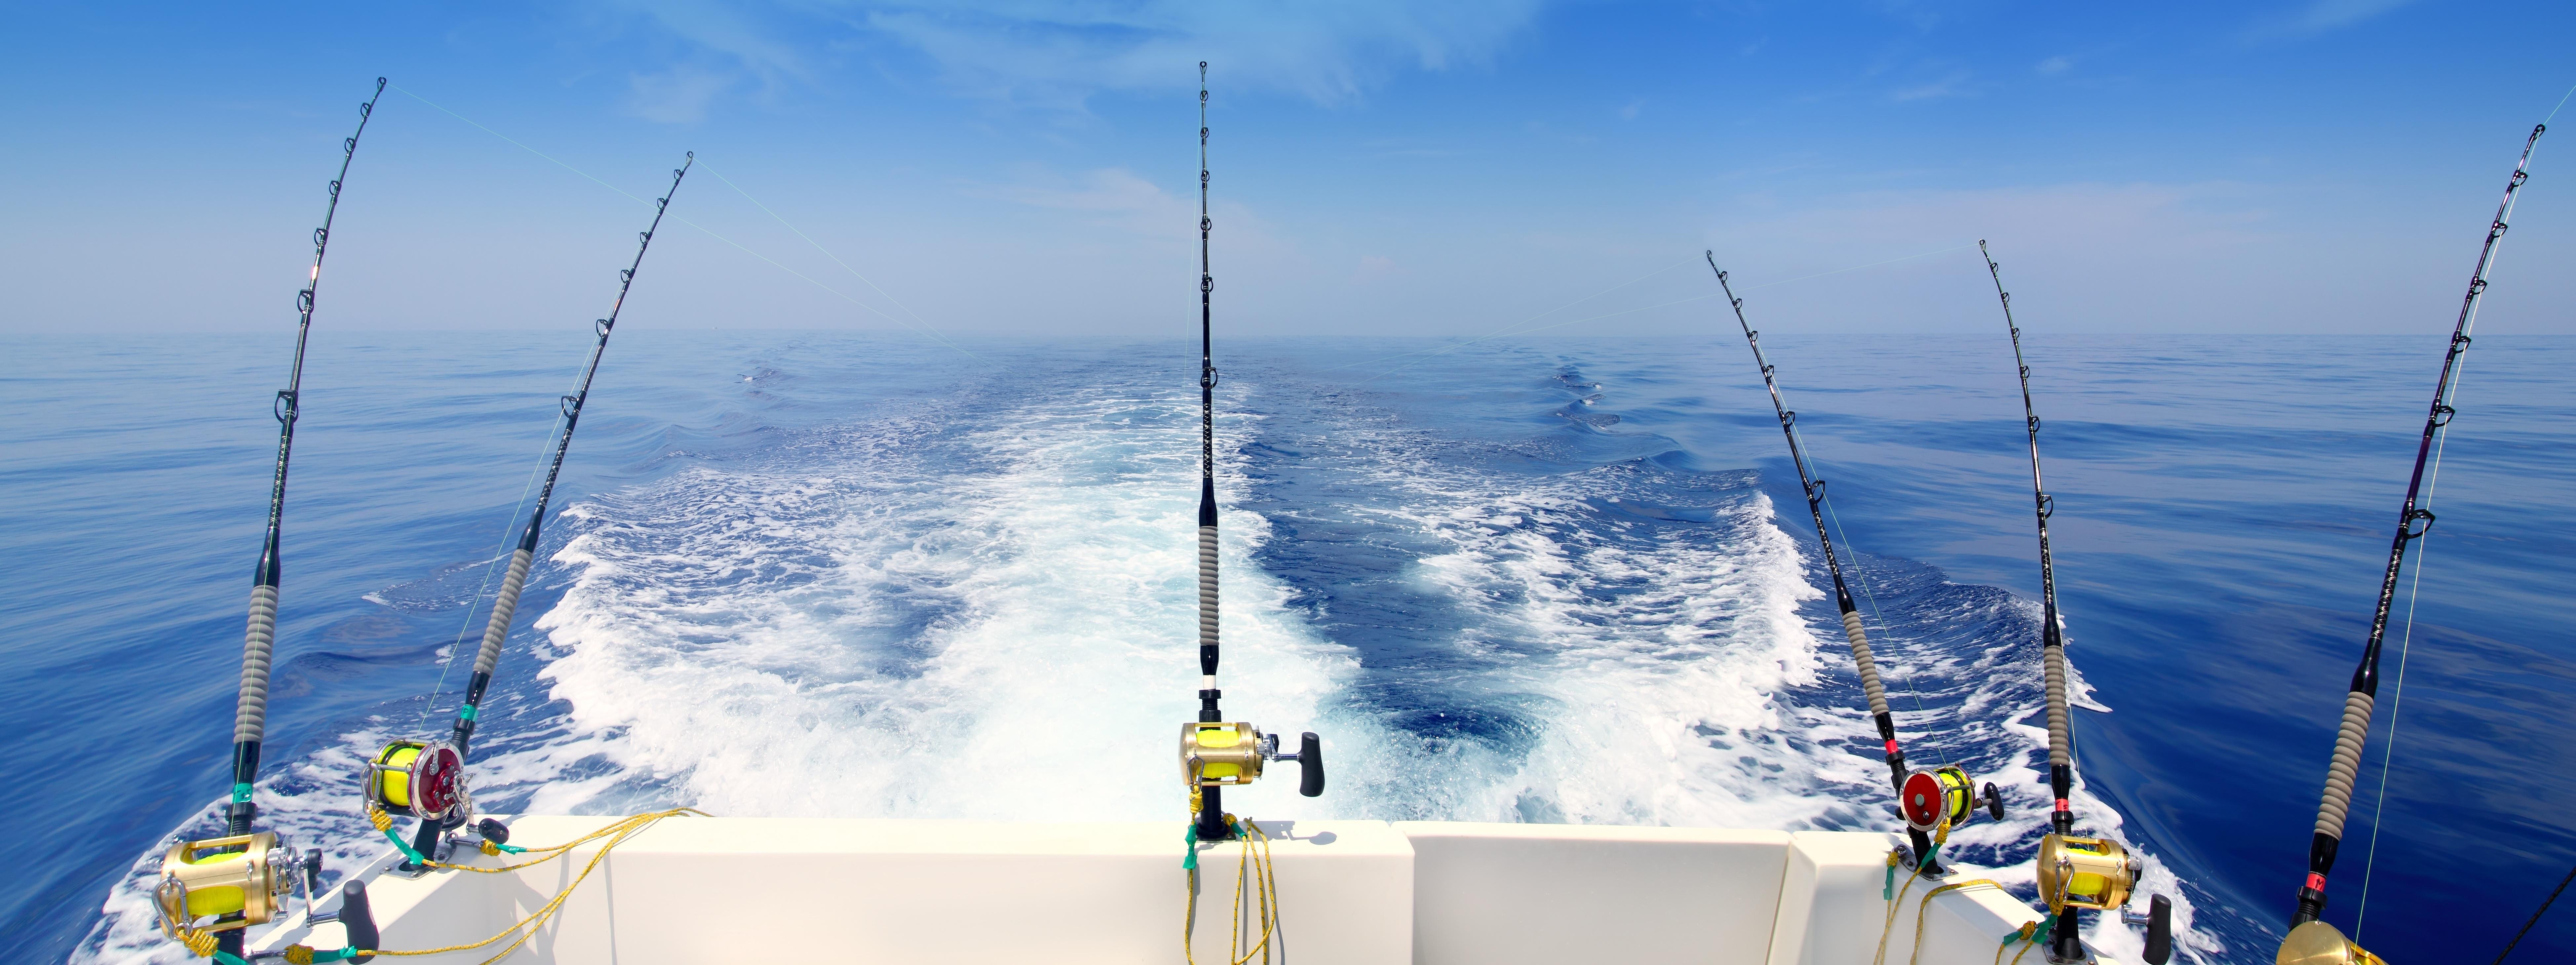 NH Fisheries